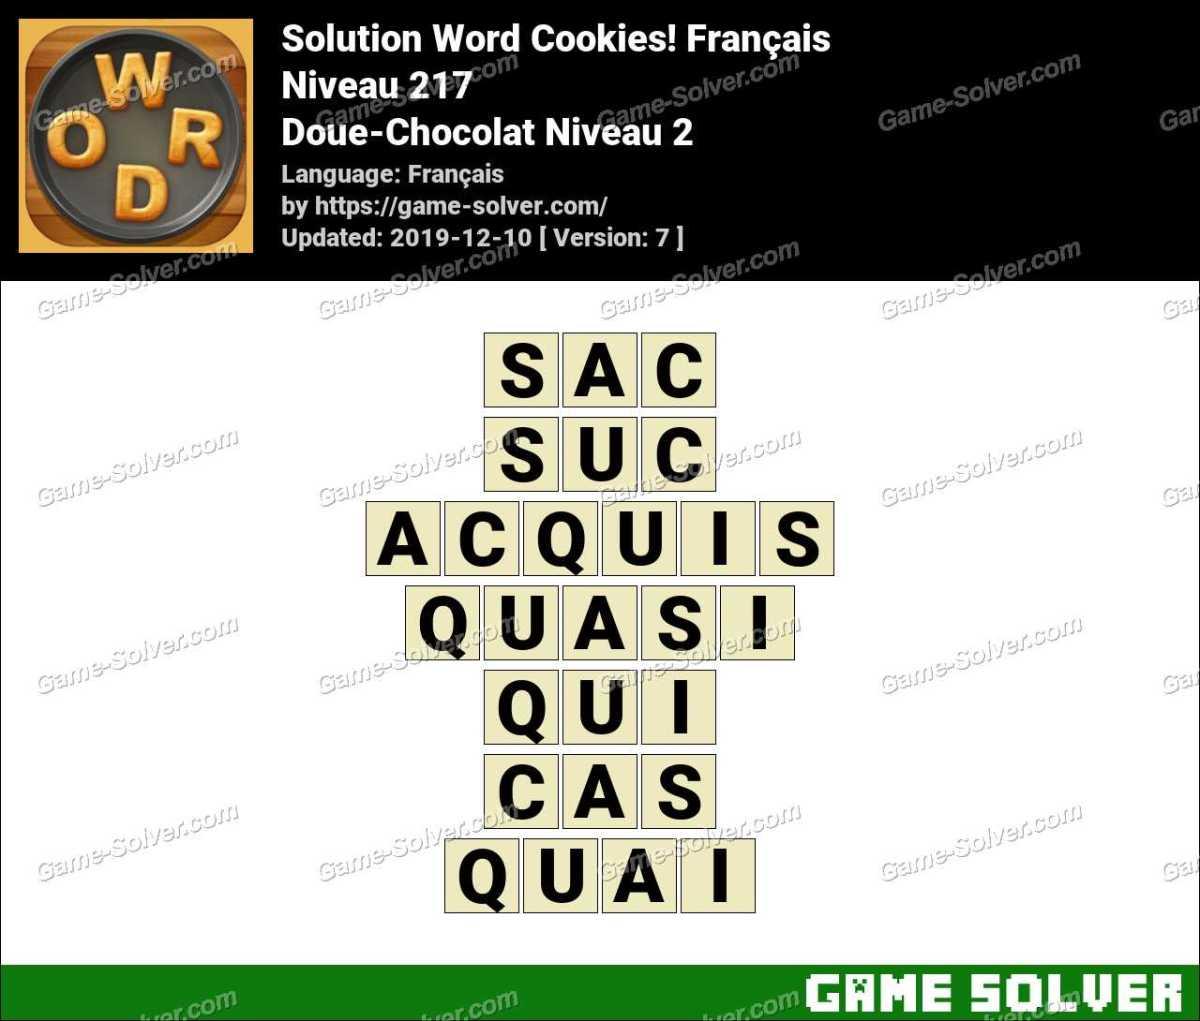 Solution Word Cookies Doue-Chocolat Niveau 2